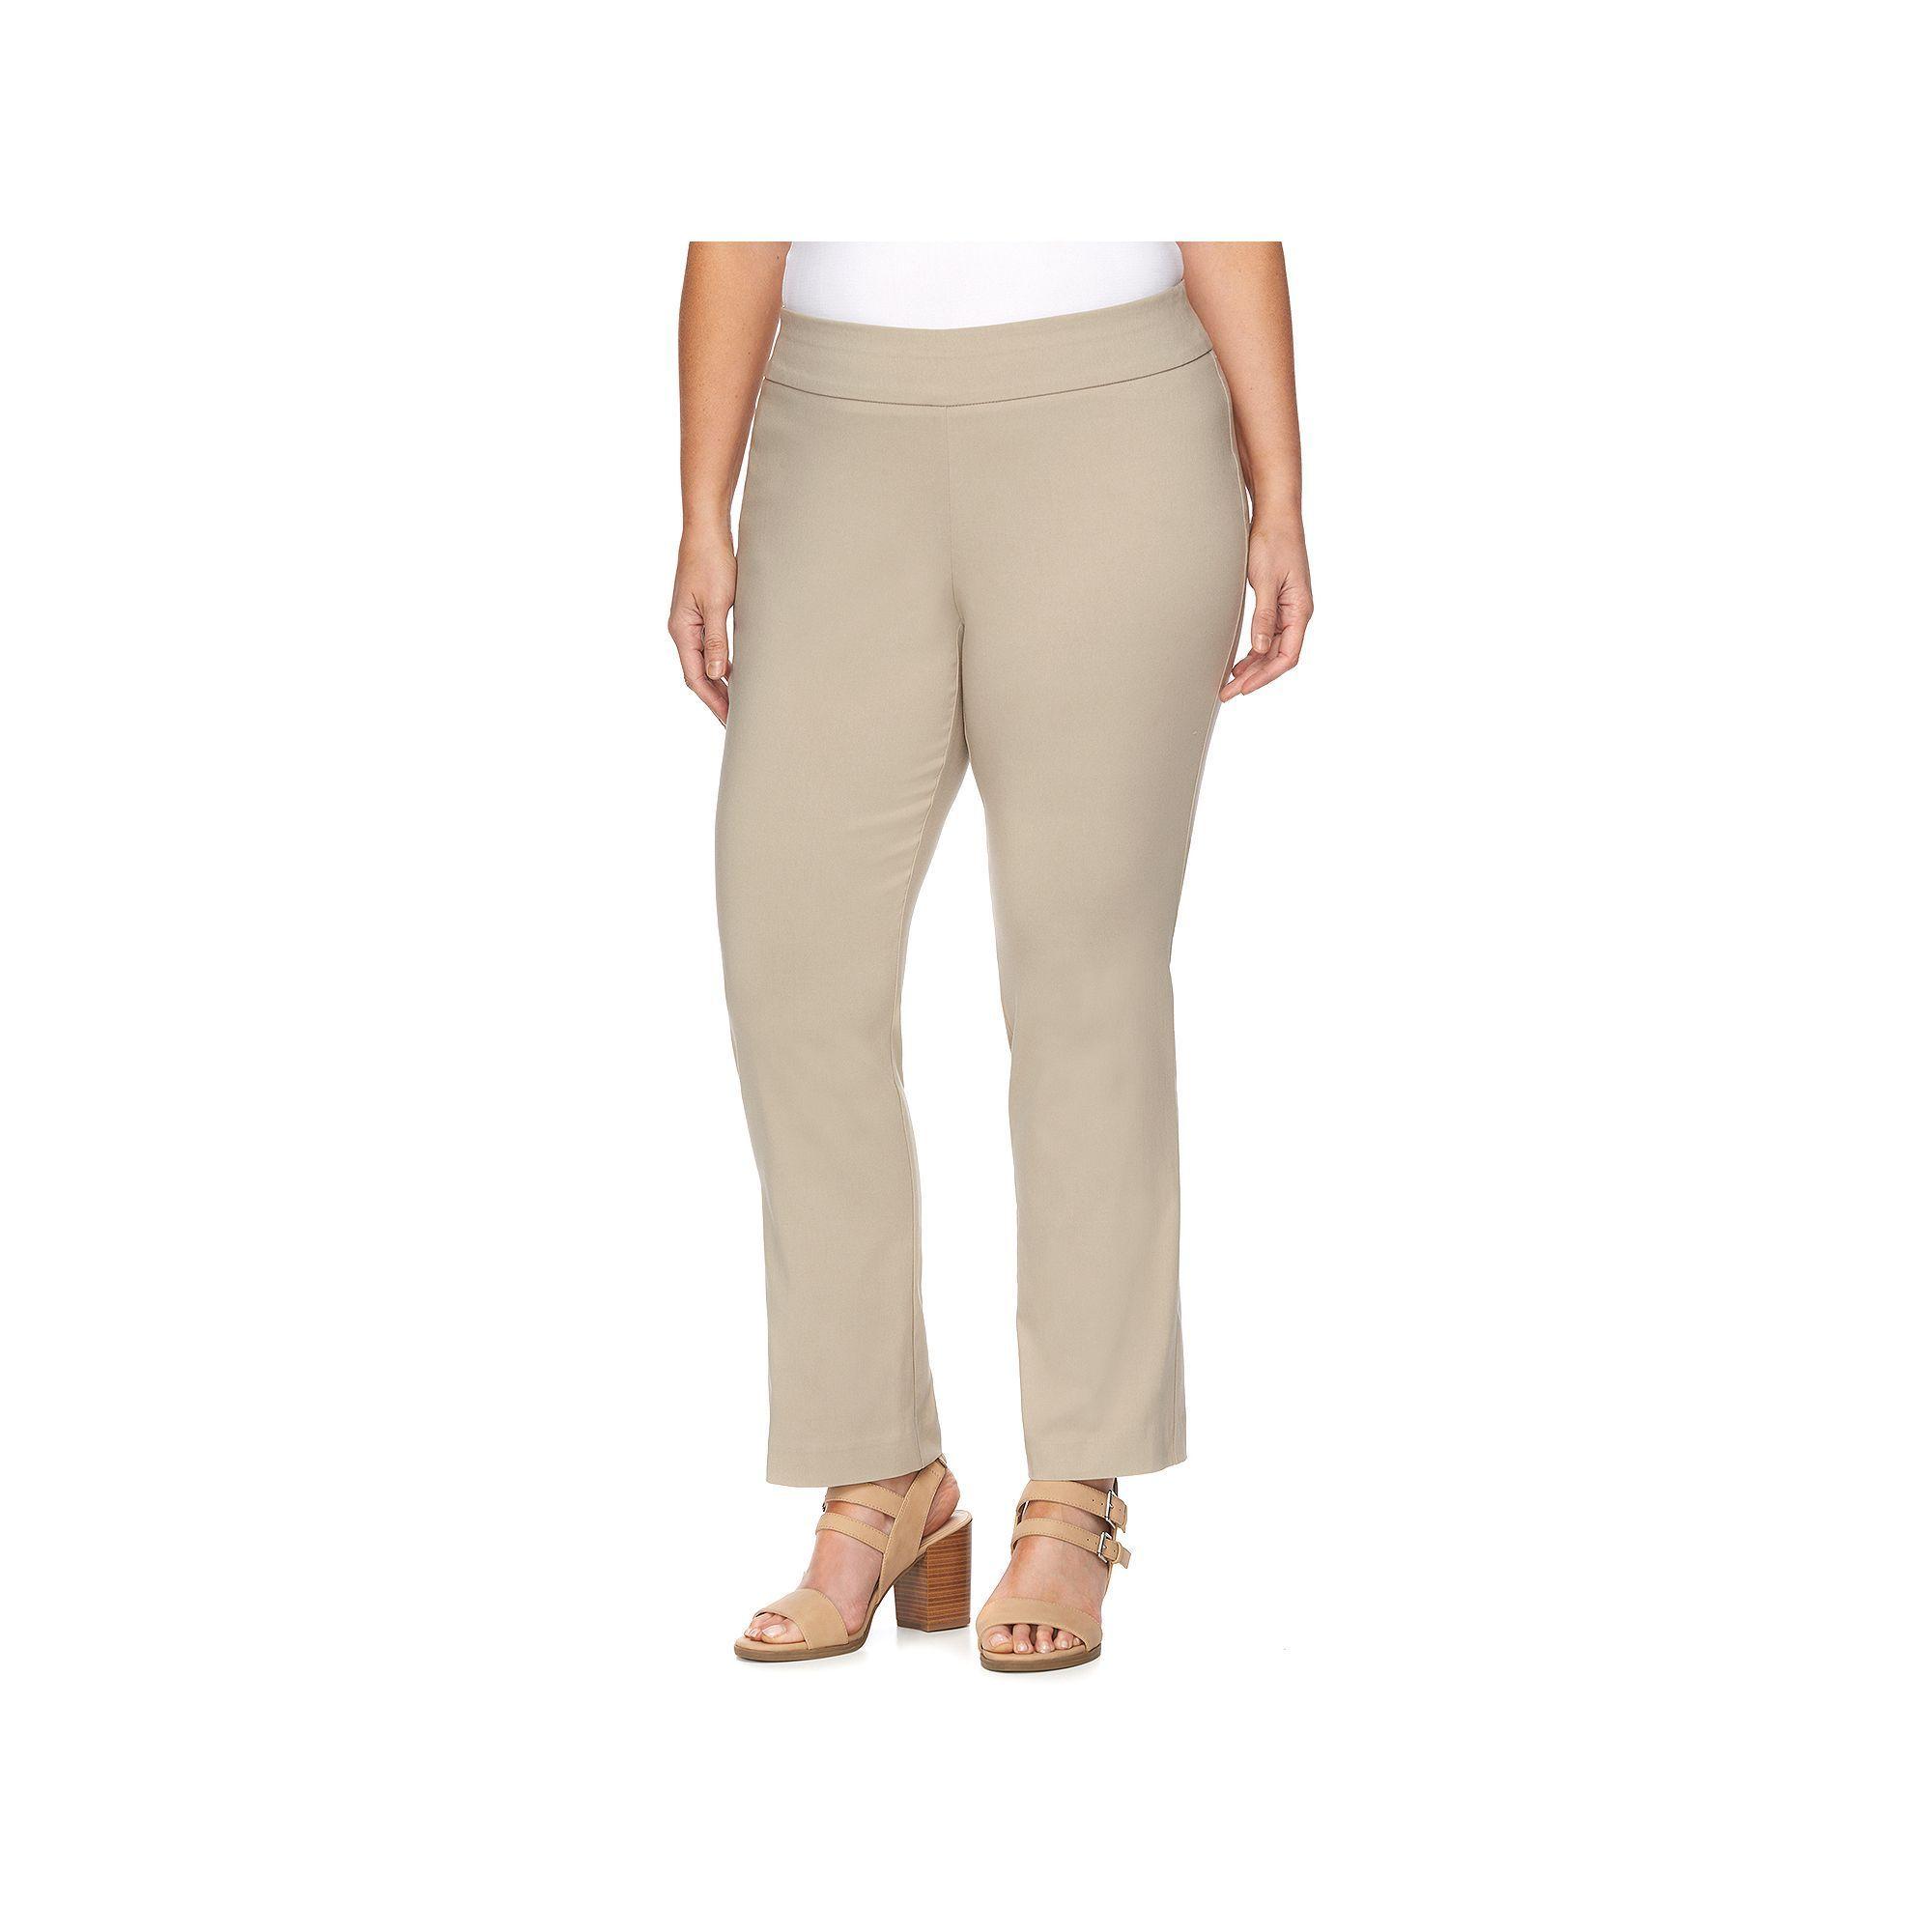 Dana buchman plus size slimming pullon pants dark brown dark and